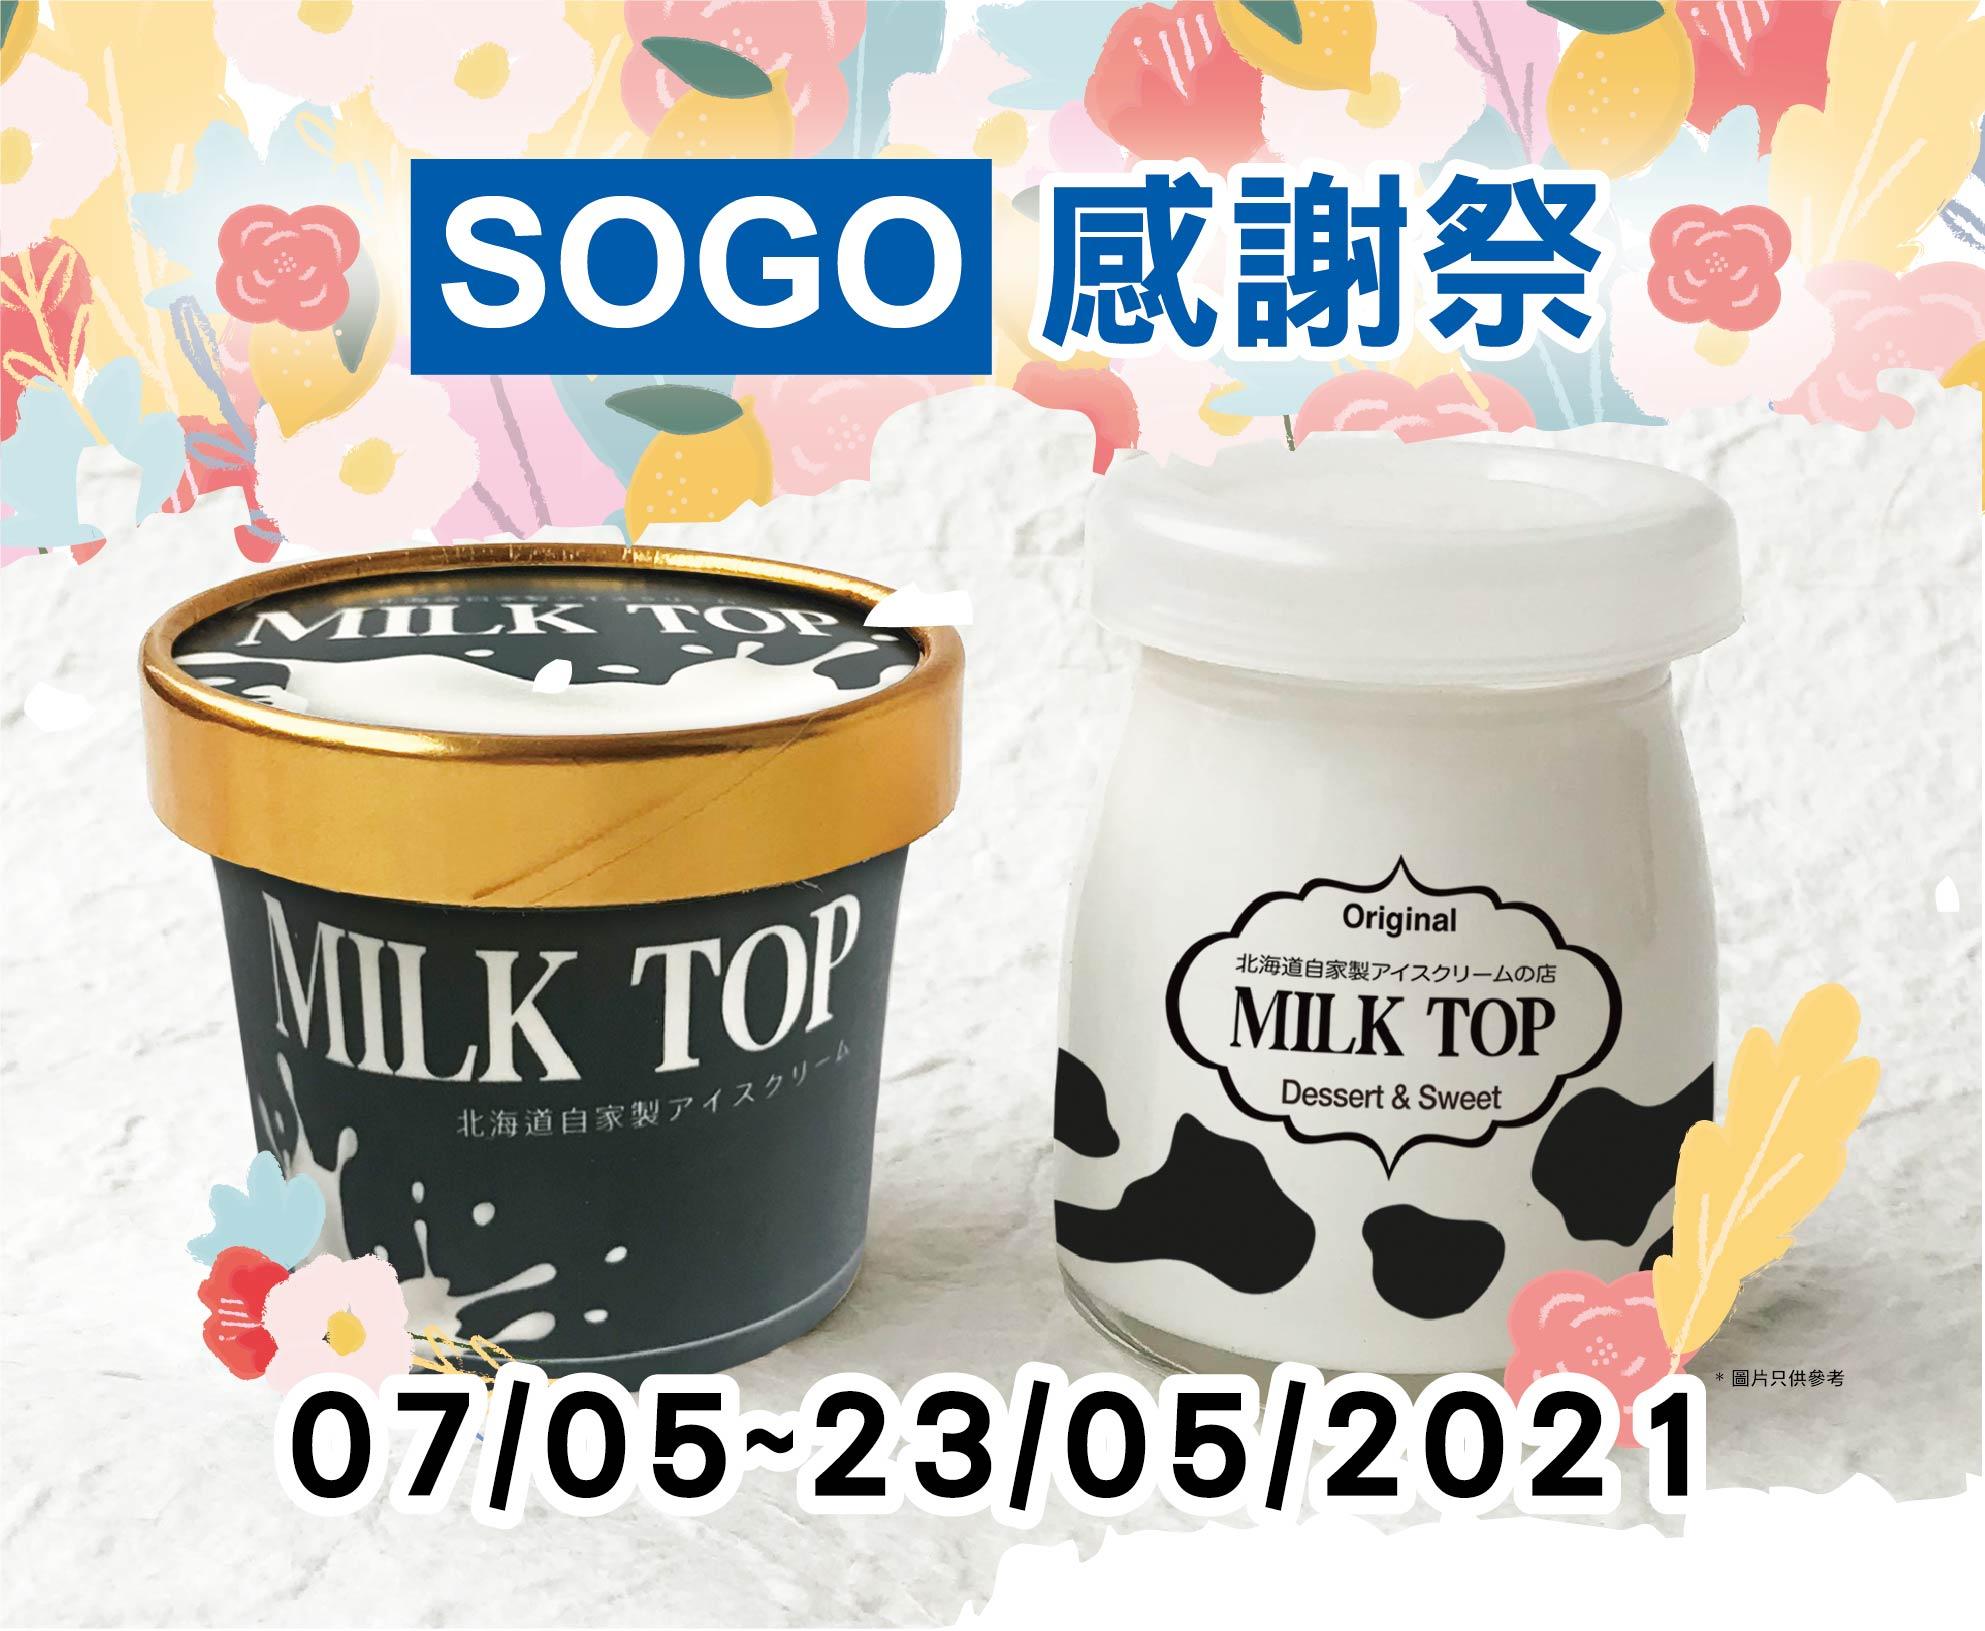 【MILK TOP 網上商店升級啦】